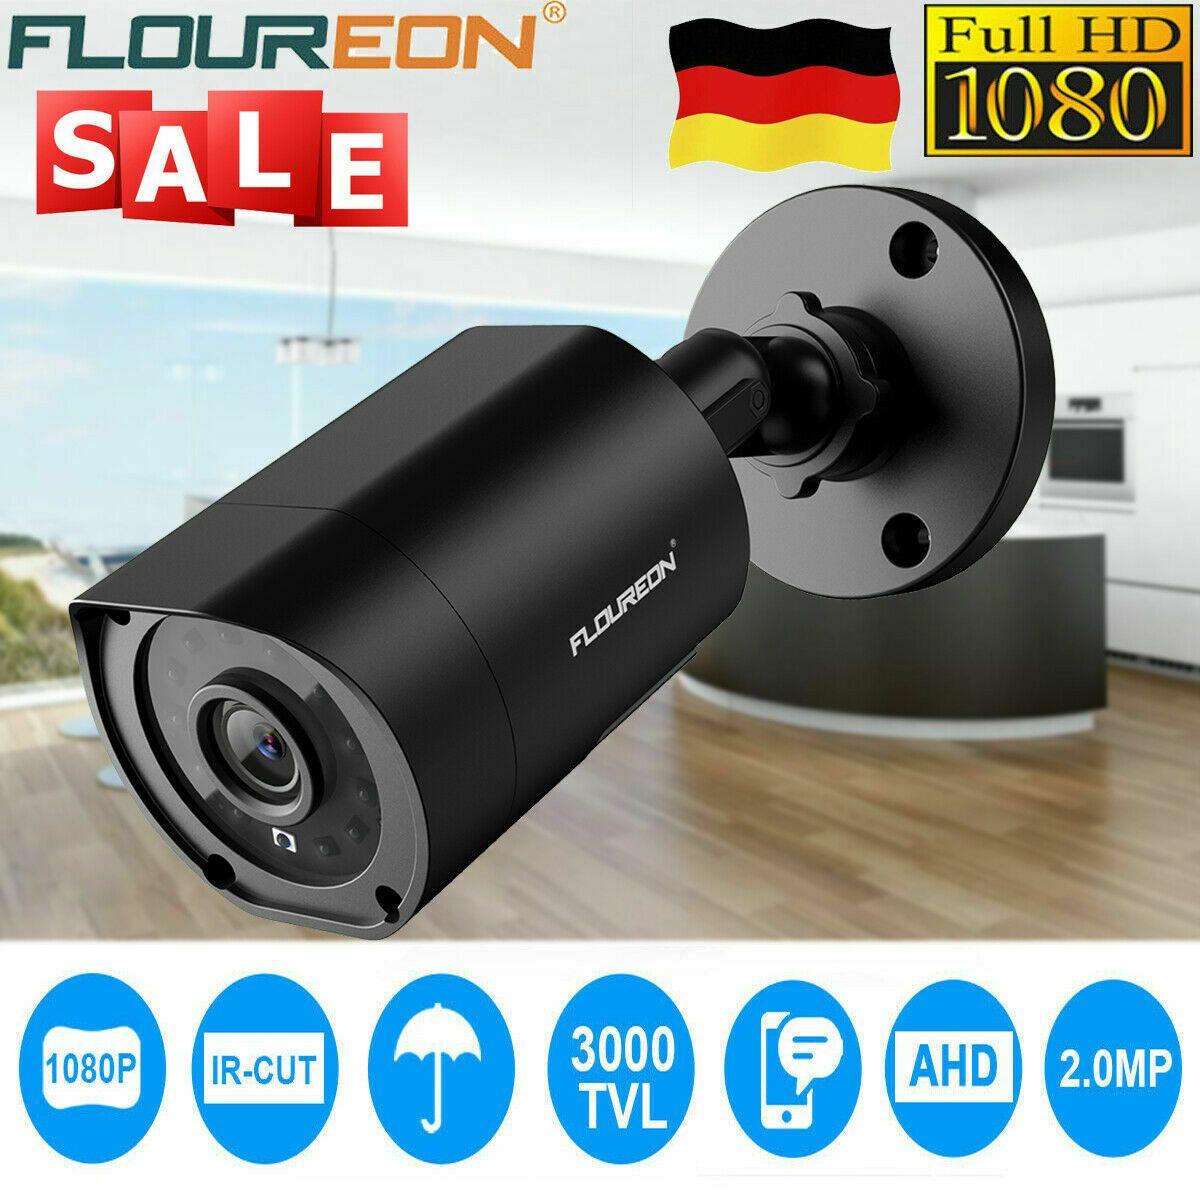 FLOUREON 3000TVL 1080P AHD CCTV DVR Kamera Überwachungskamera Wasserdicht